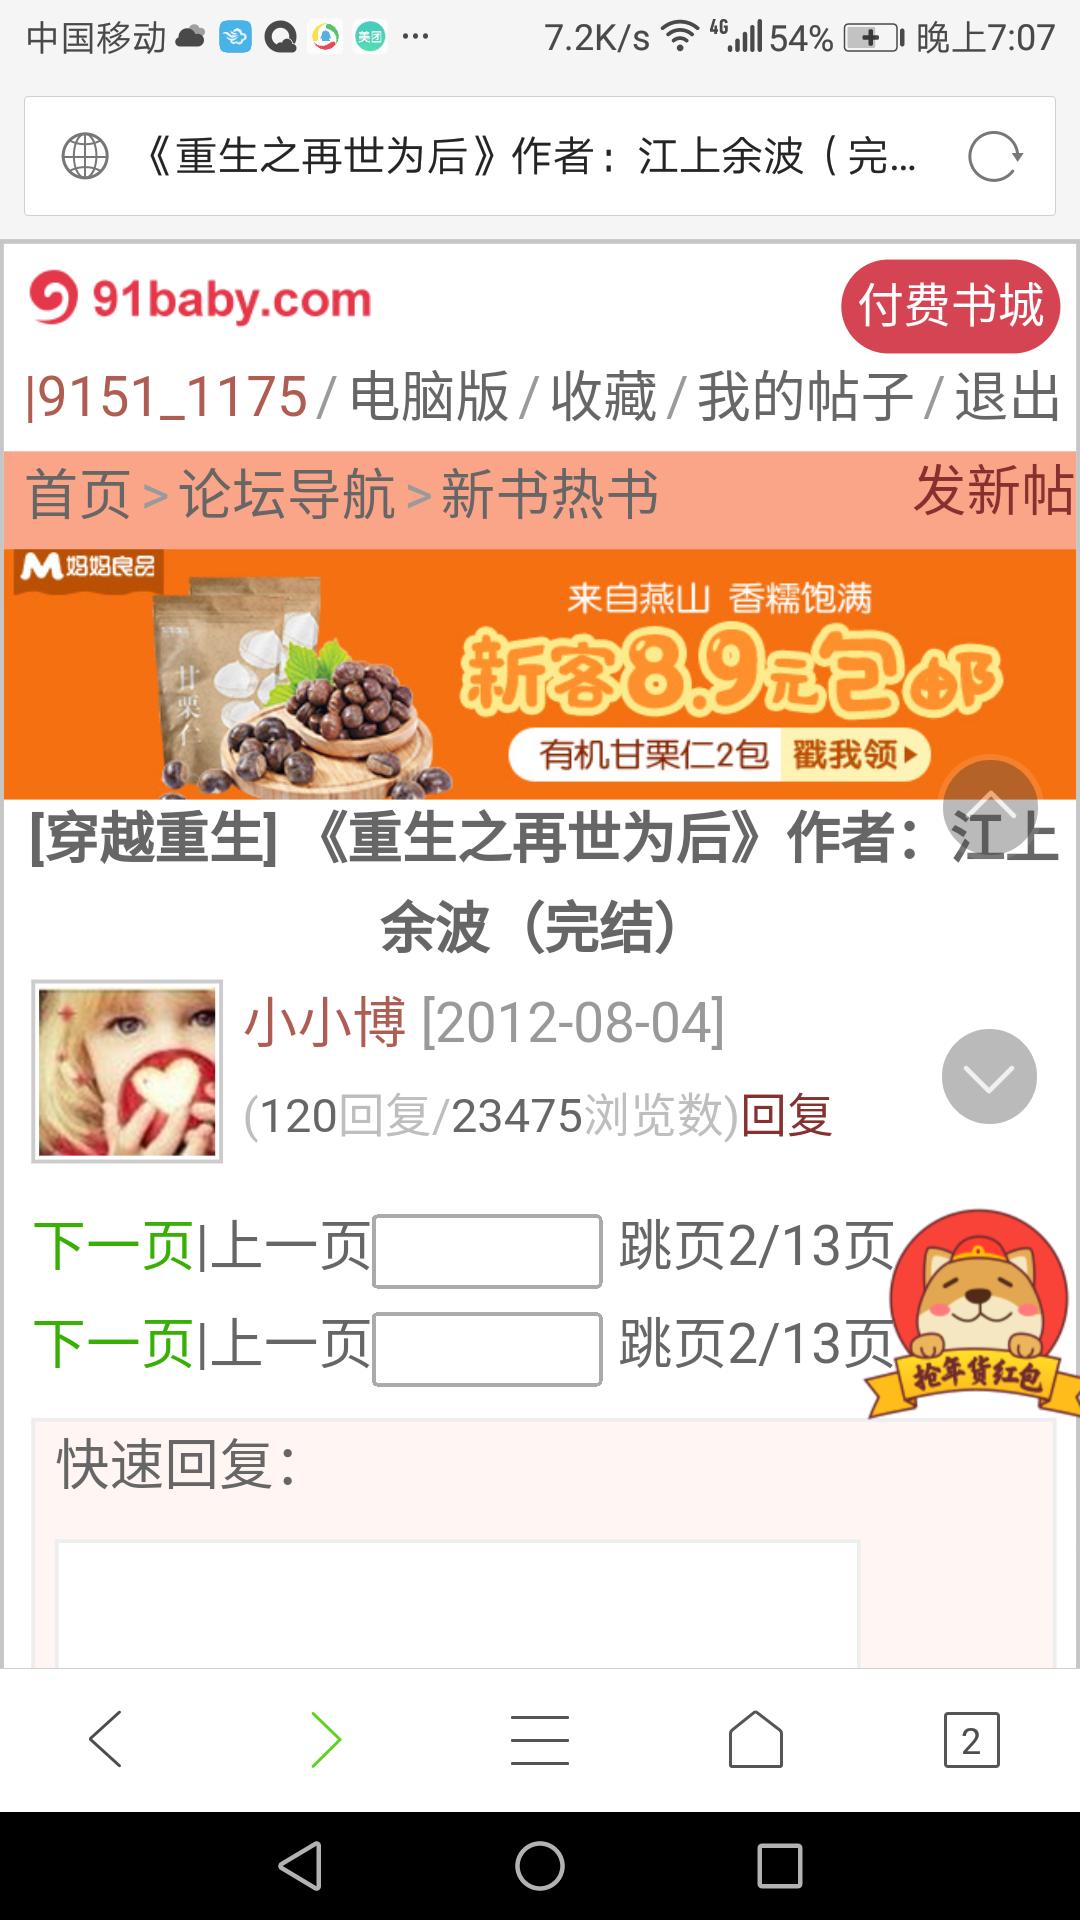 Screenshot_20180125-190724.png